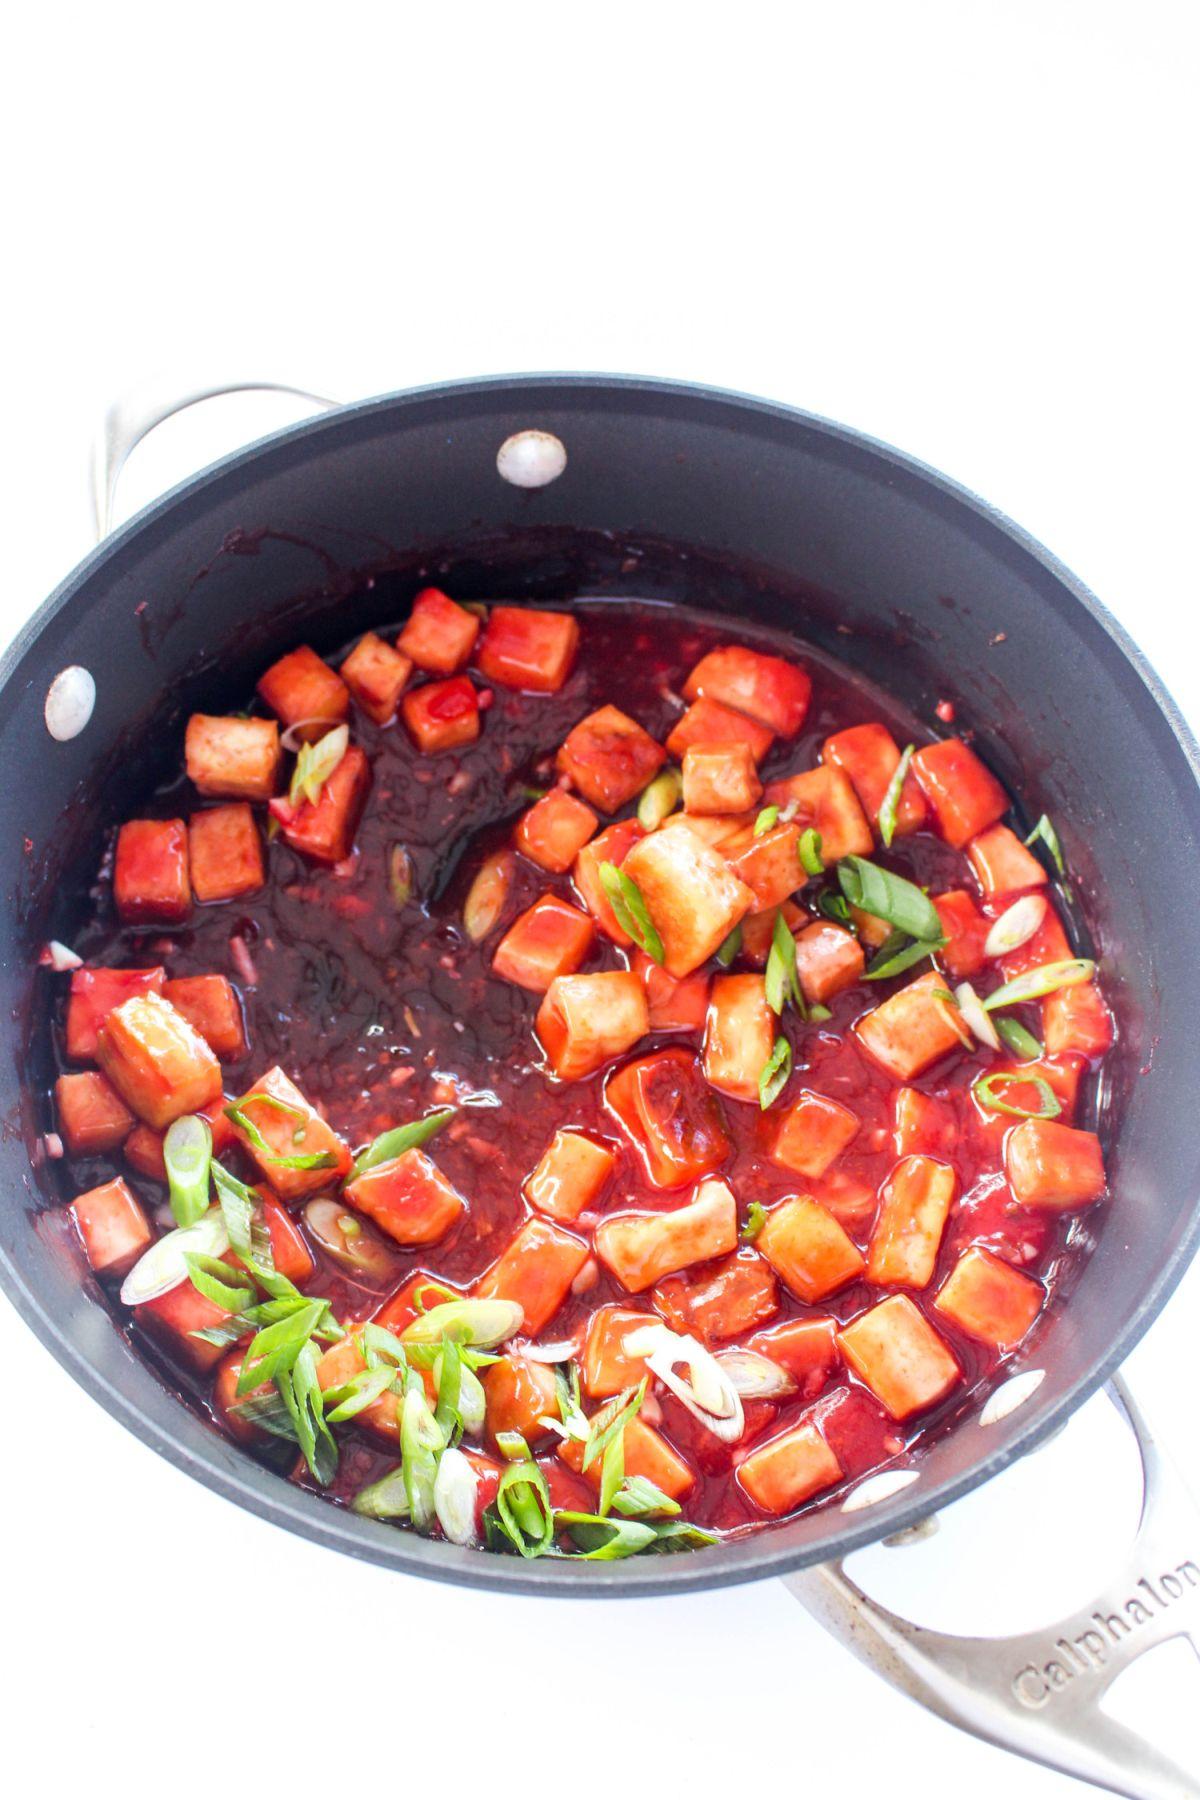 Tofu Rice Bowls with Sweet and Sour Blood Orange Sauce - pot